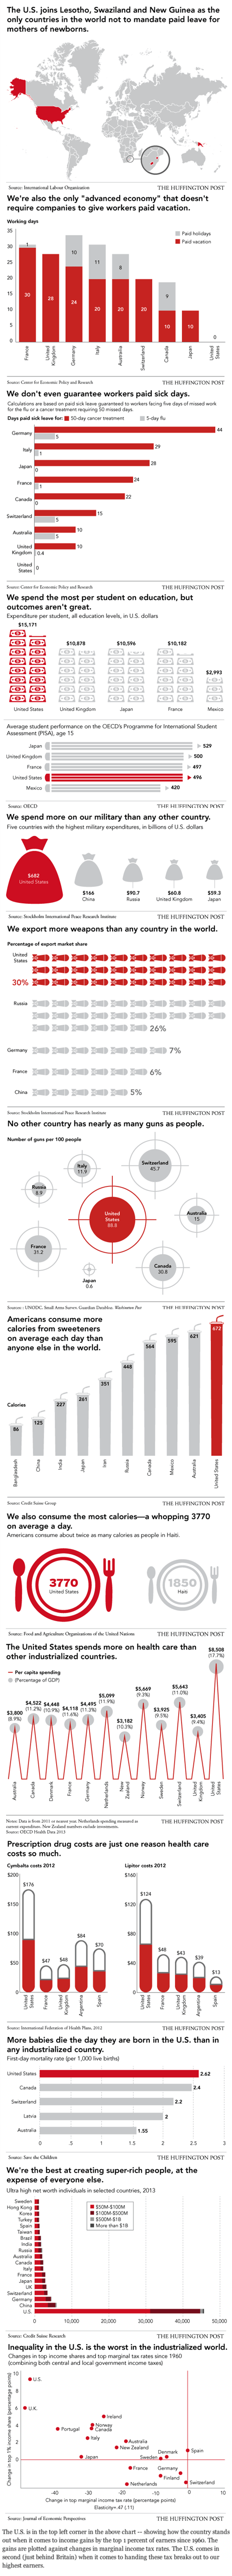 america around the world infographic huffington post - 7900901376